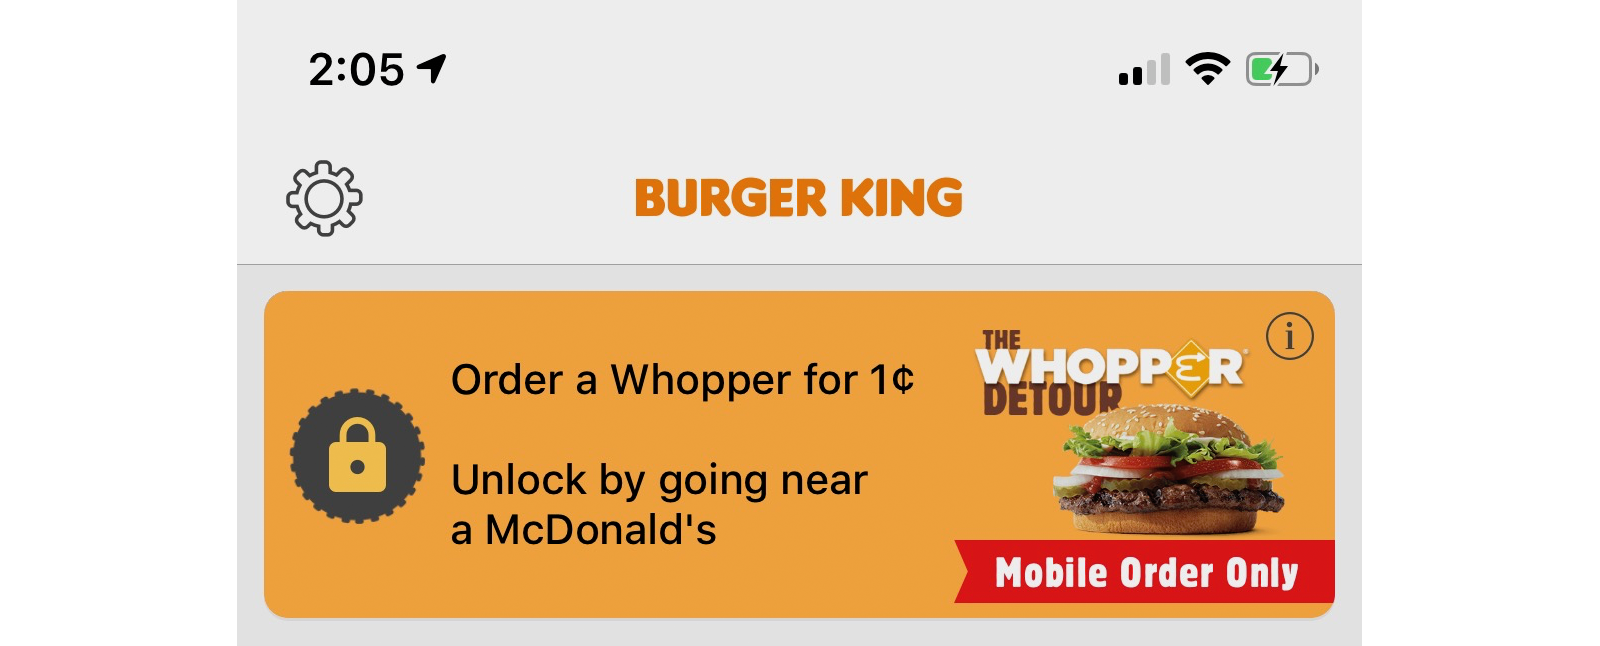 https://s3.amazonaws.com/io.radar.blog/posts/case-study-burger-king-whopper-detour/app.png